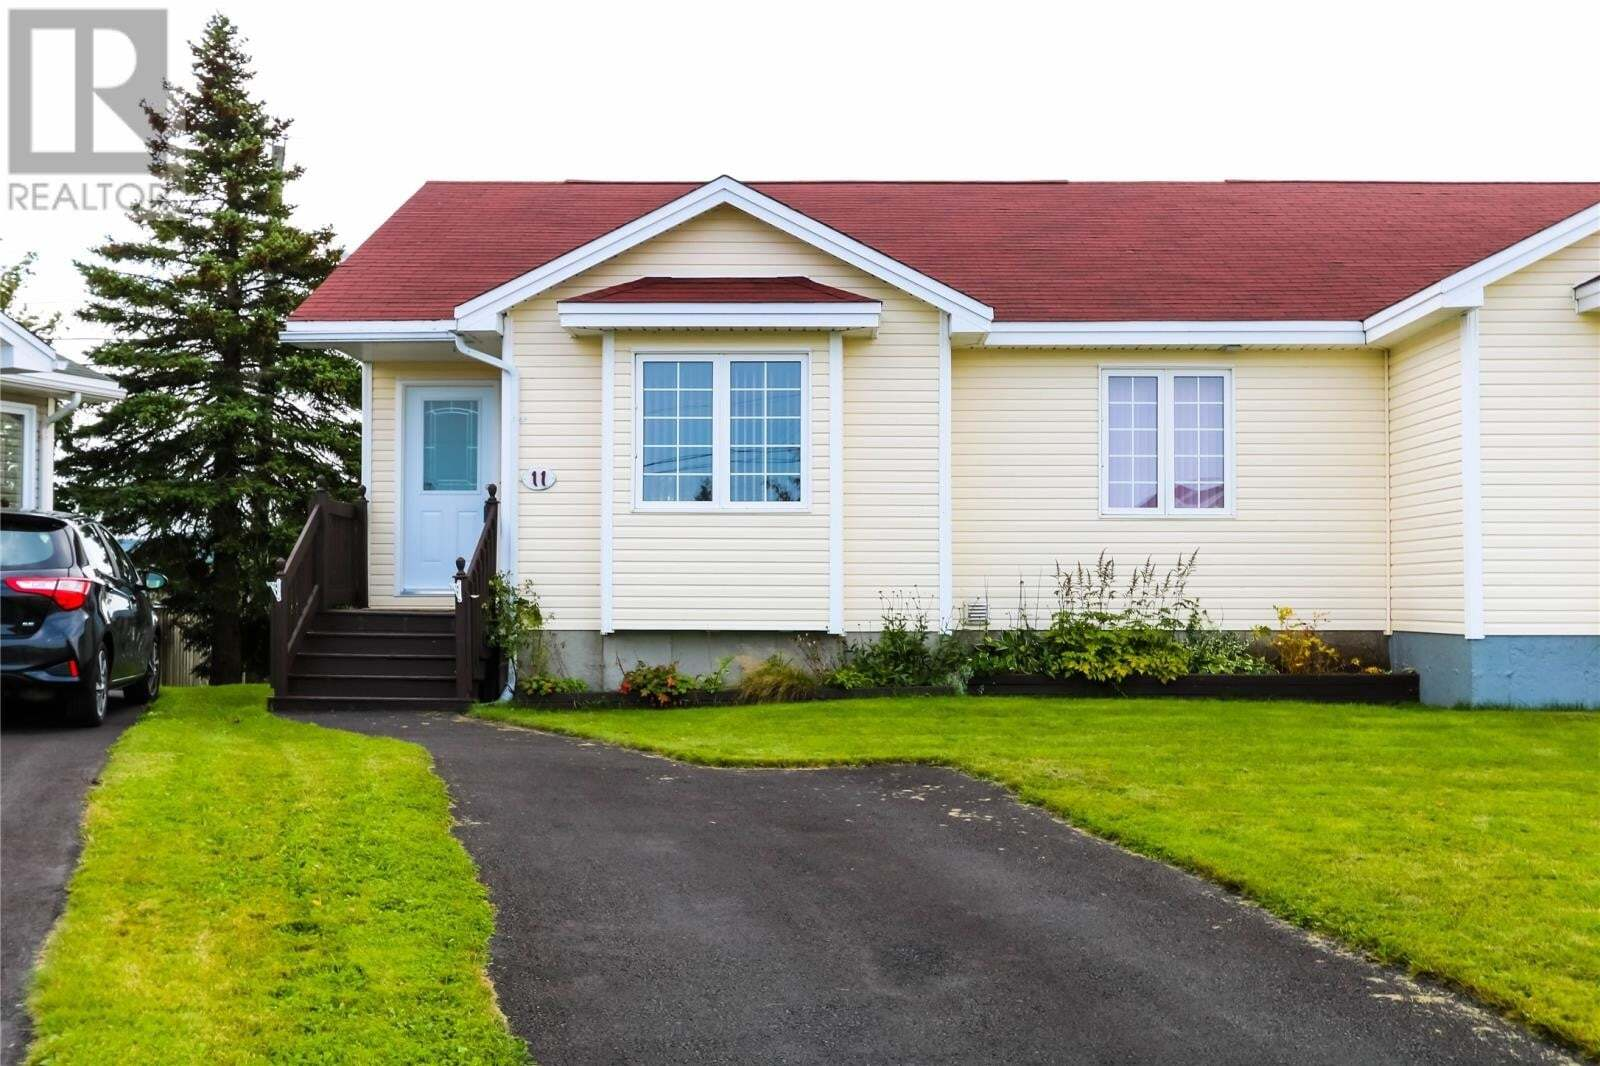 House for sale at 11 Madigan Pl St. John's Newfoundland - MLS: 1221532